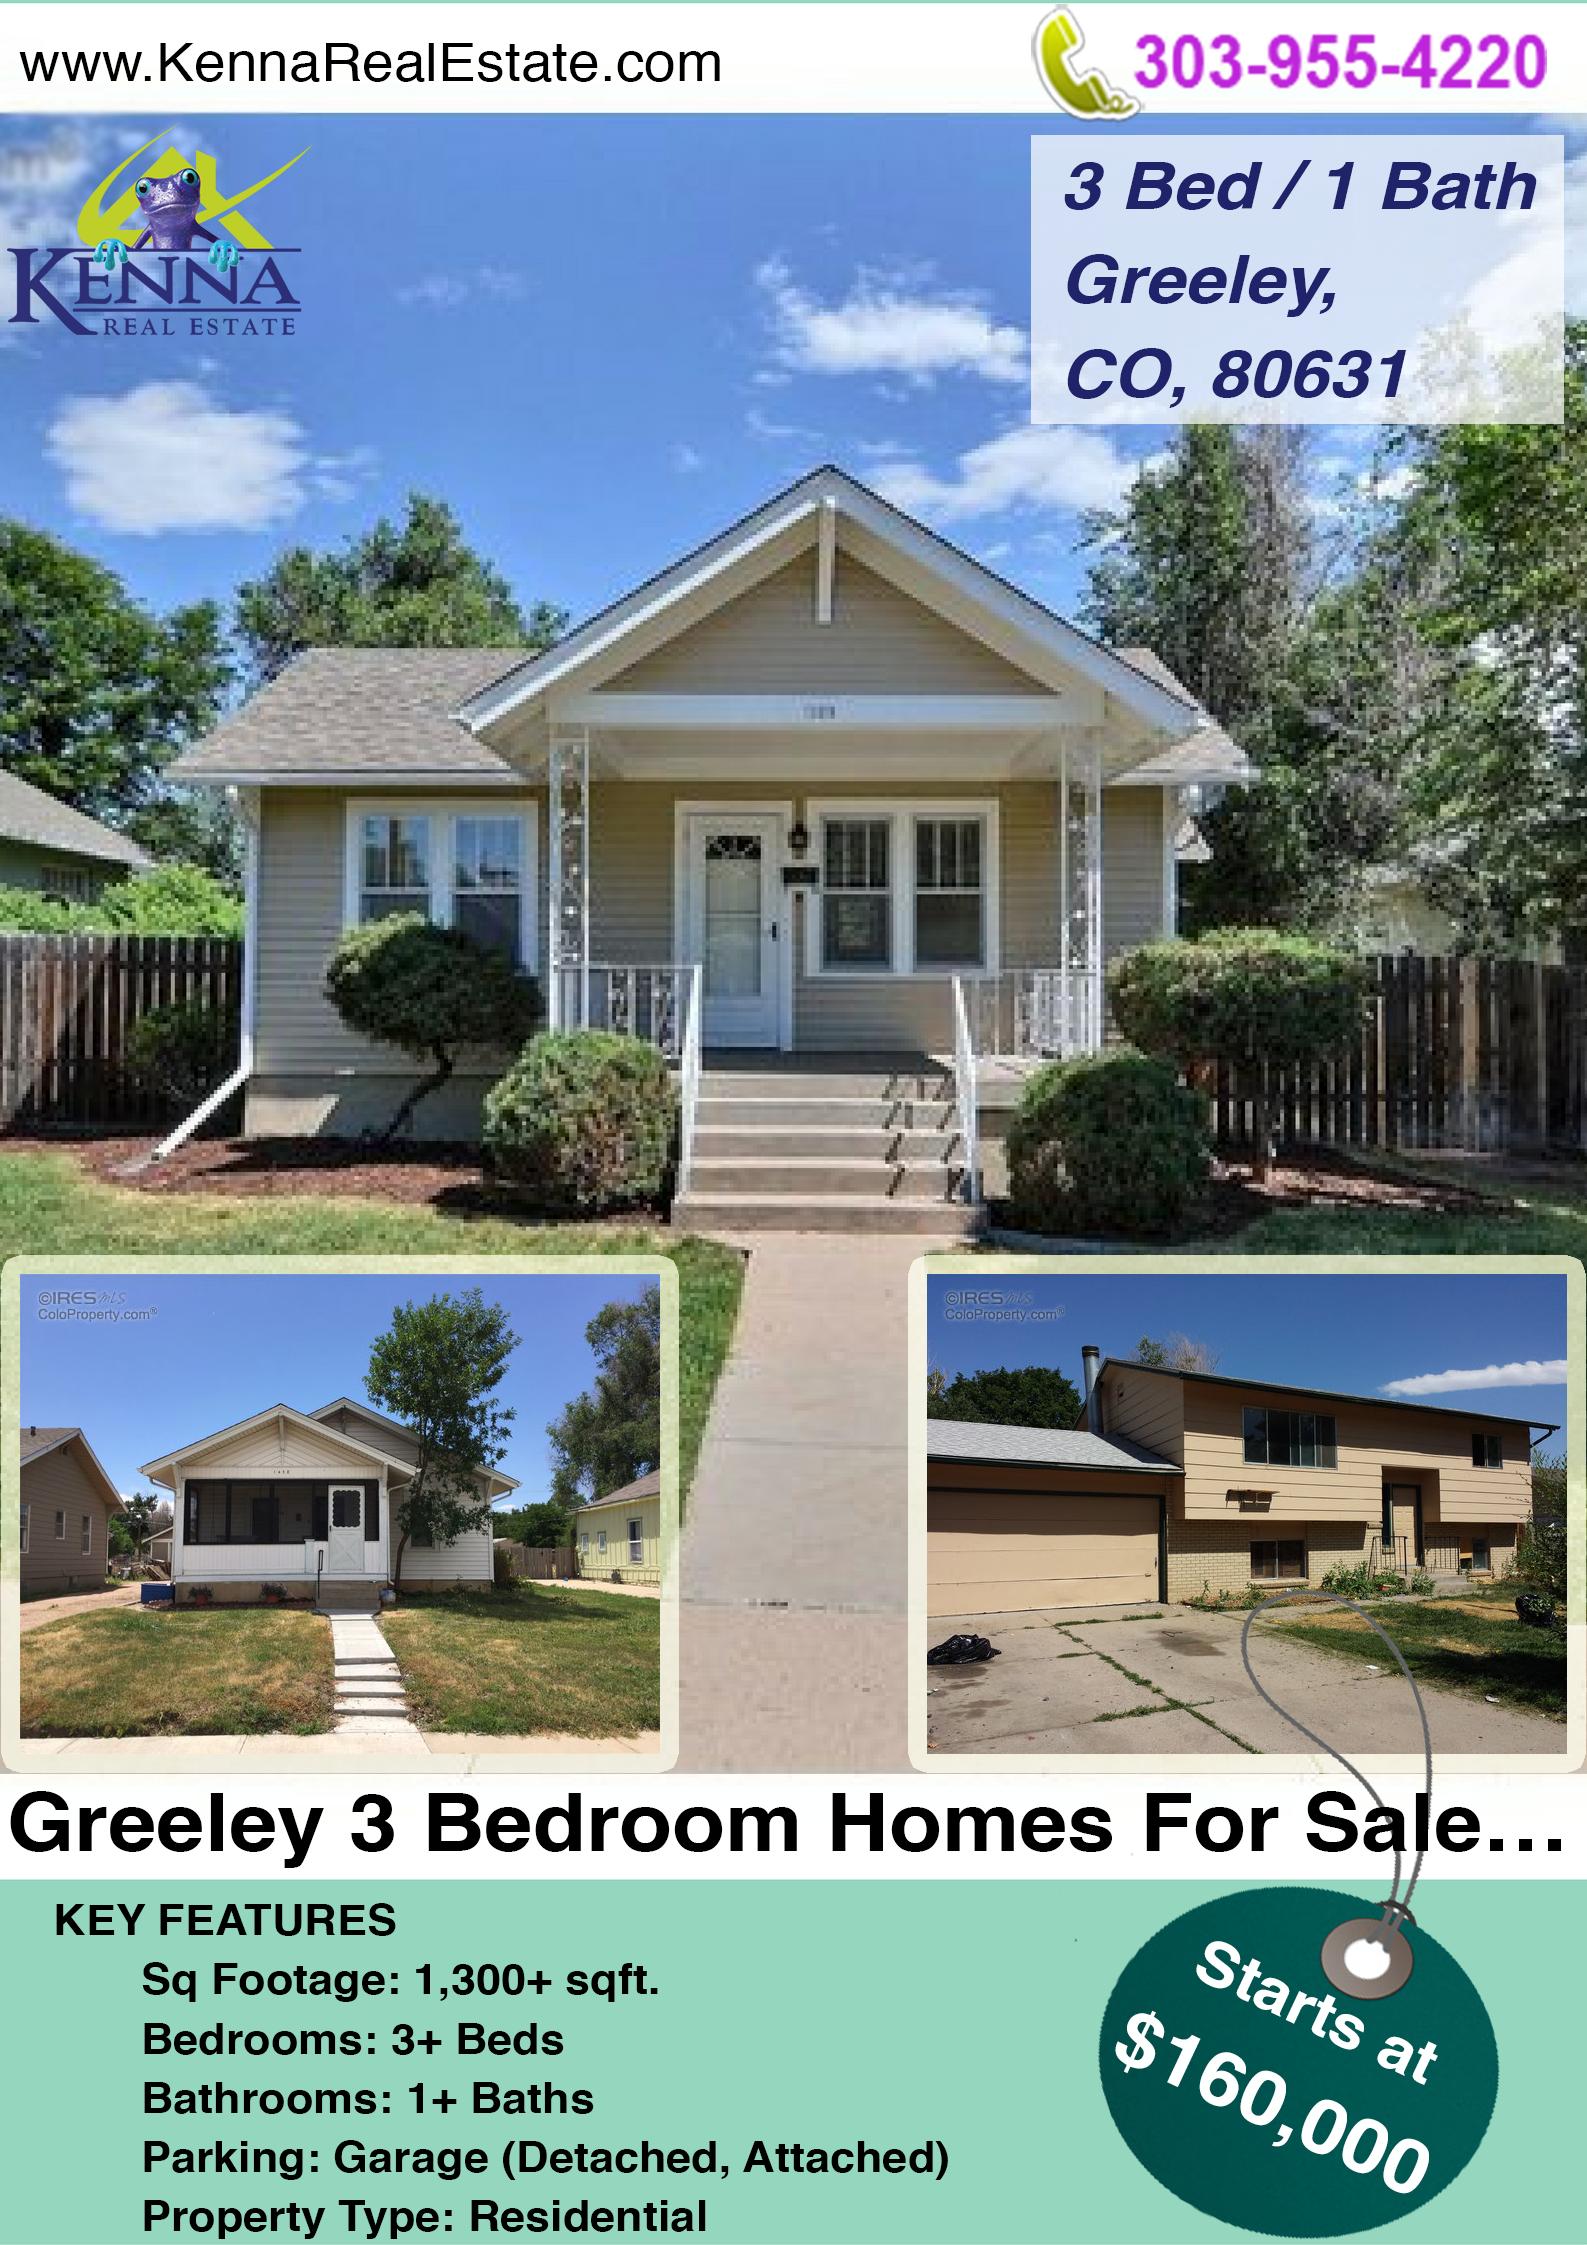 Greeley 3 Bedroom Homes For Sale... www.kennarealestate